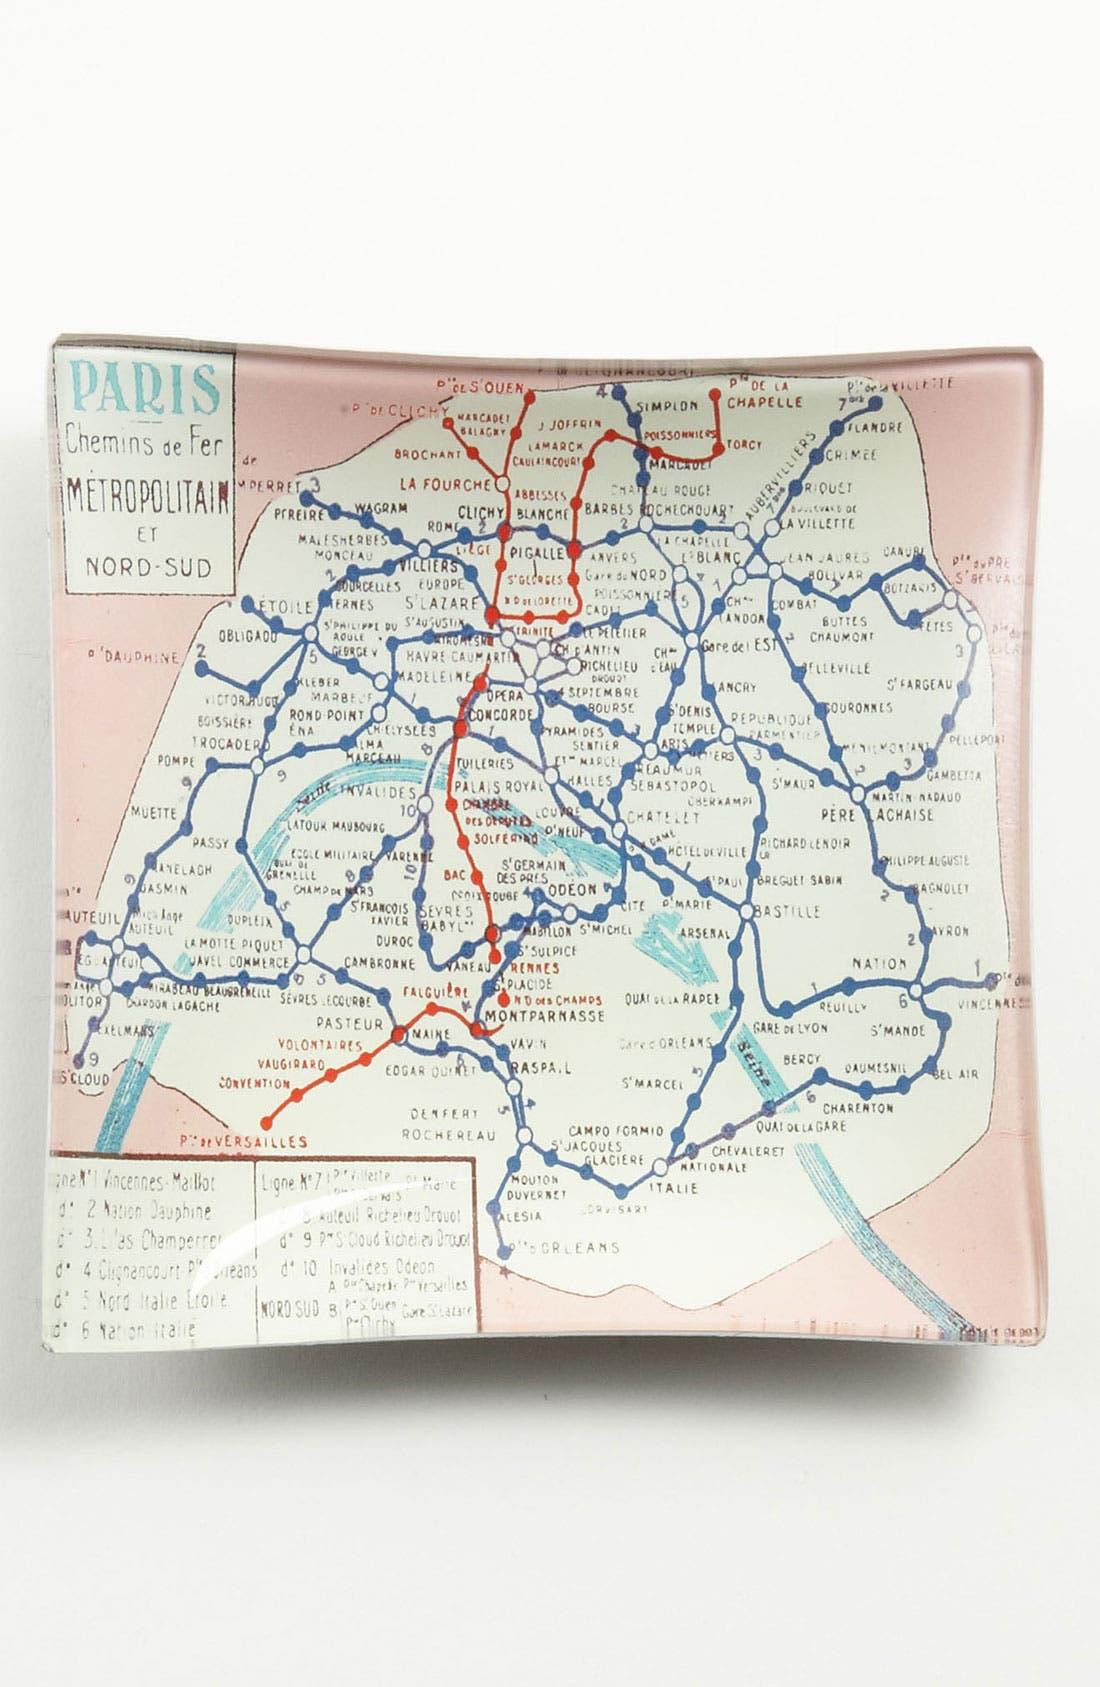 Alternate Image 1 Selected - Ben's Garden 'Vintage Paris Métro' Trinket Tray